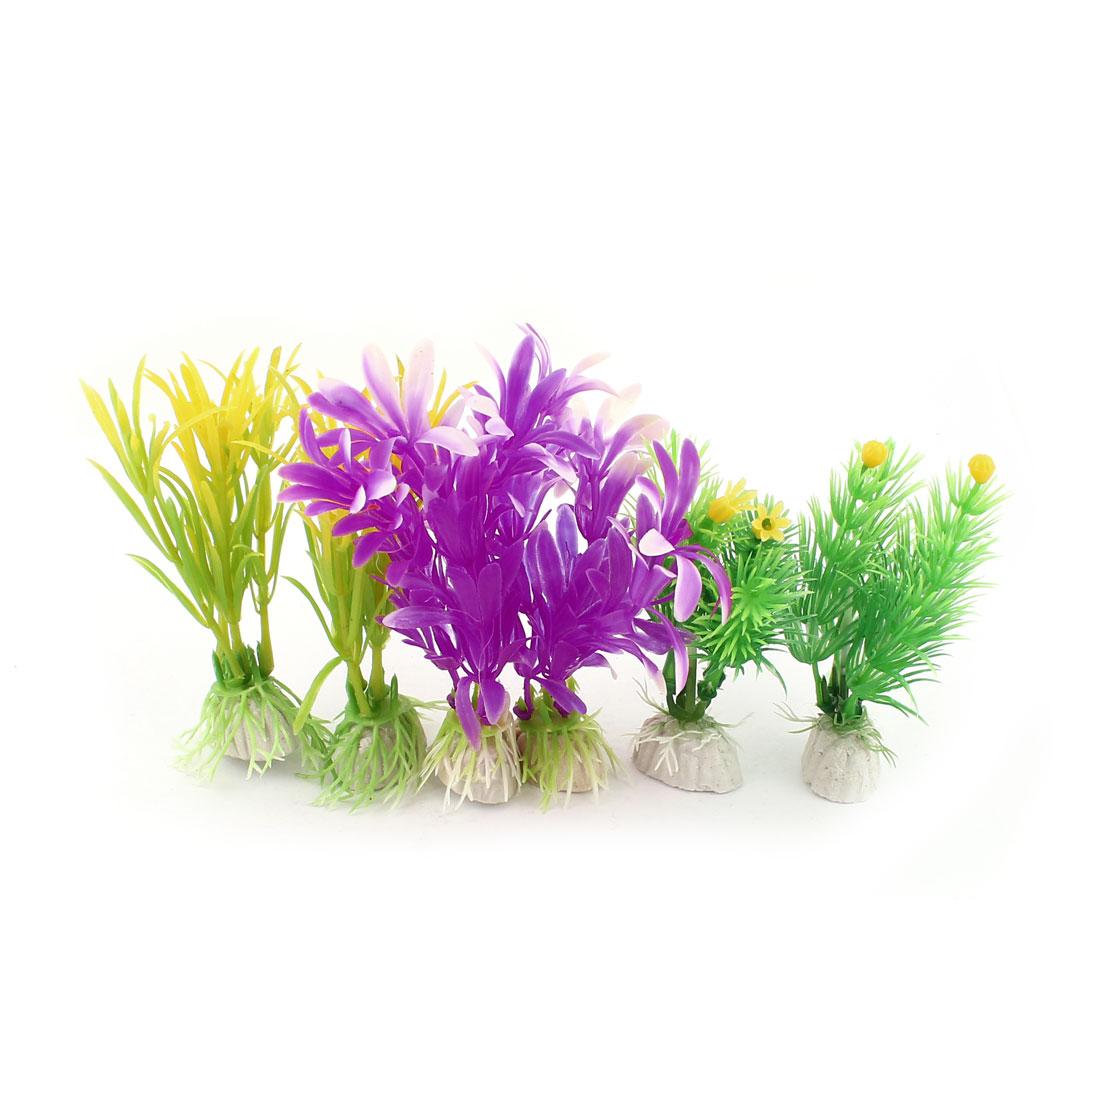 "Fish Tank Decor 3.5"" Green Plastic Grass Flower Artificial Underwater Plant 6 Pcs"